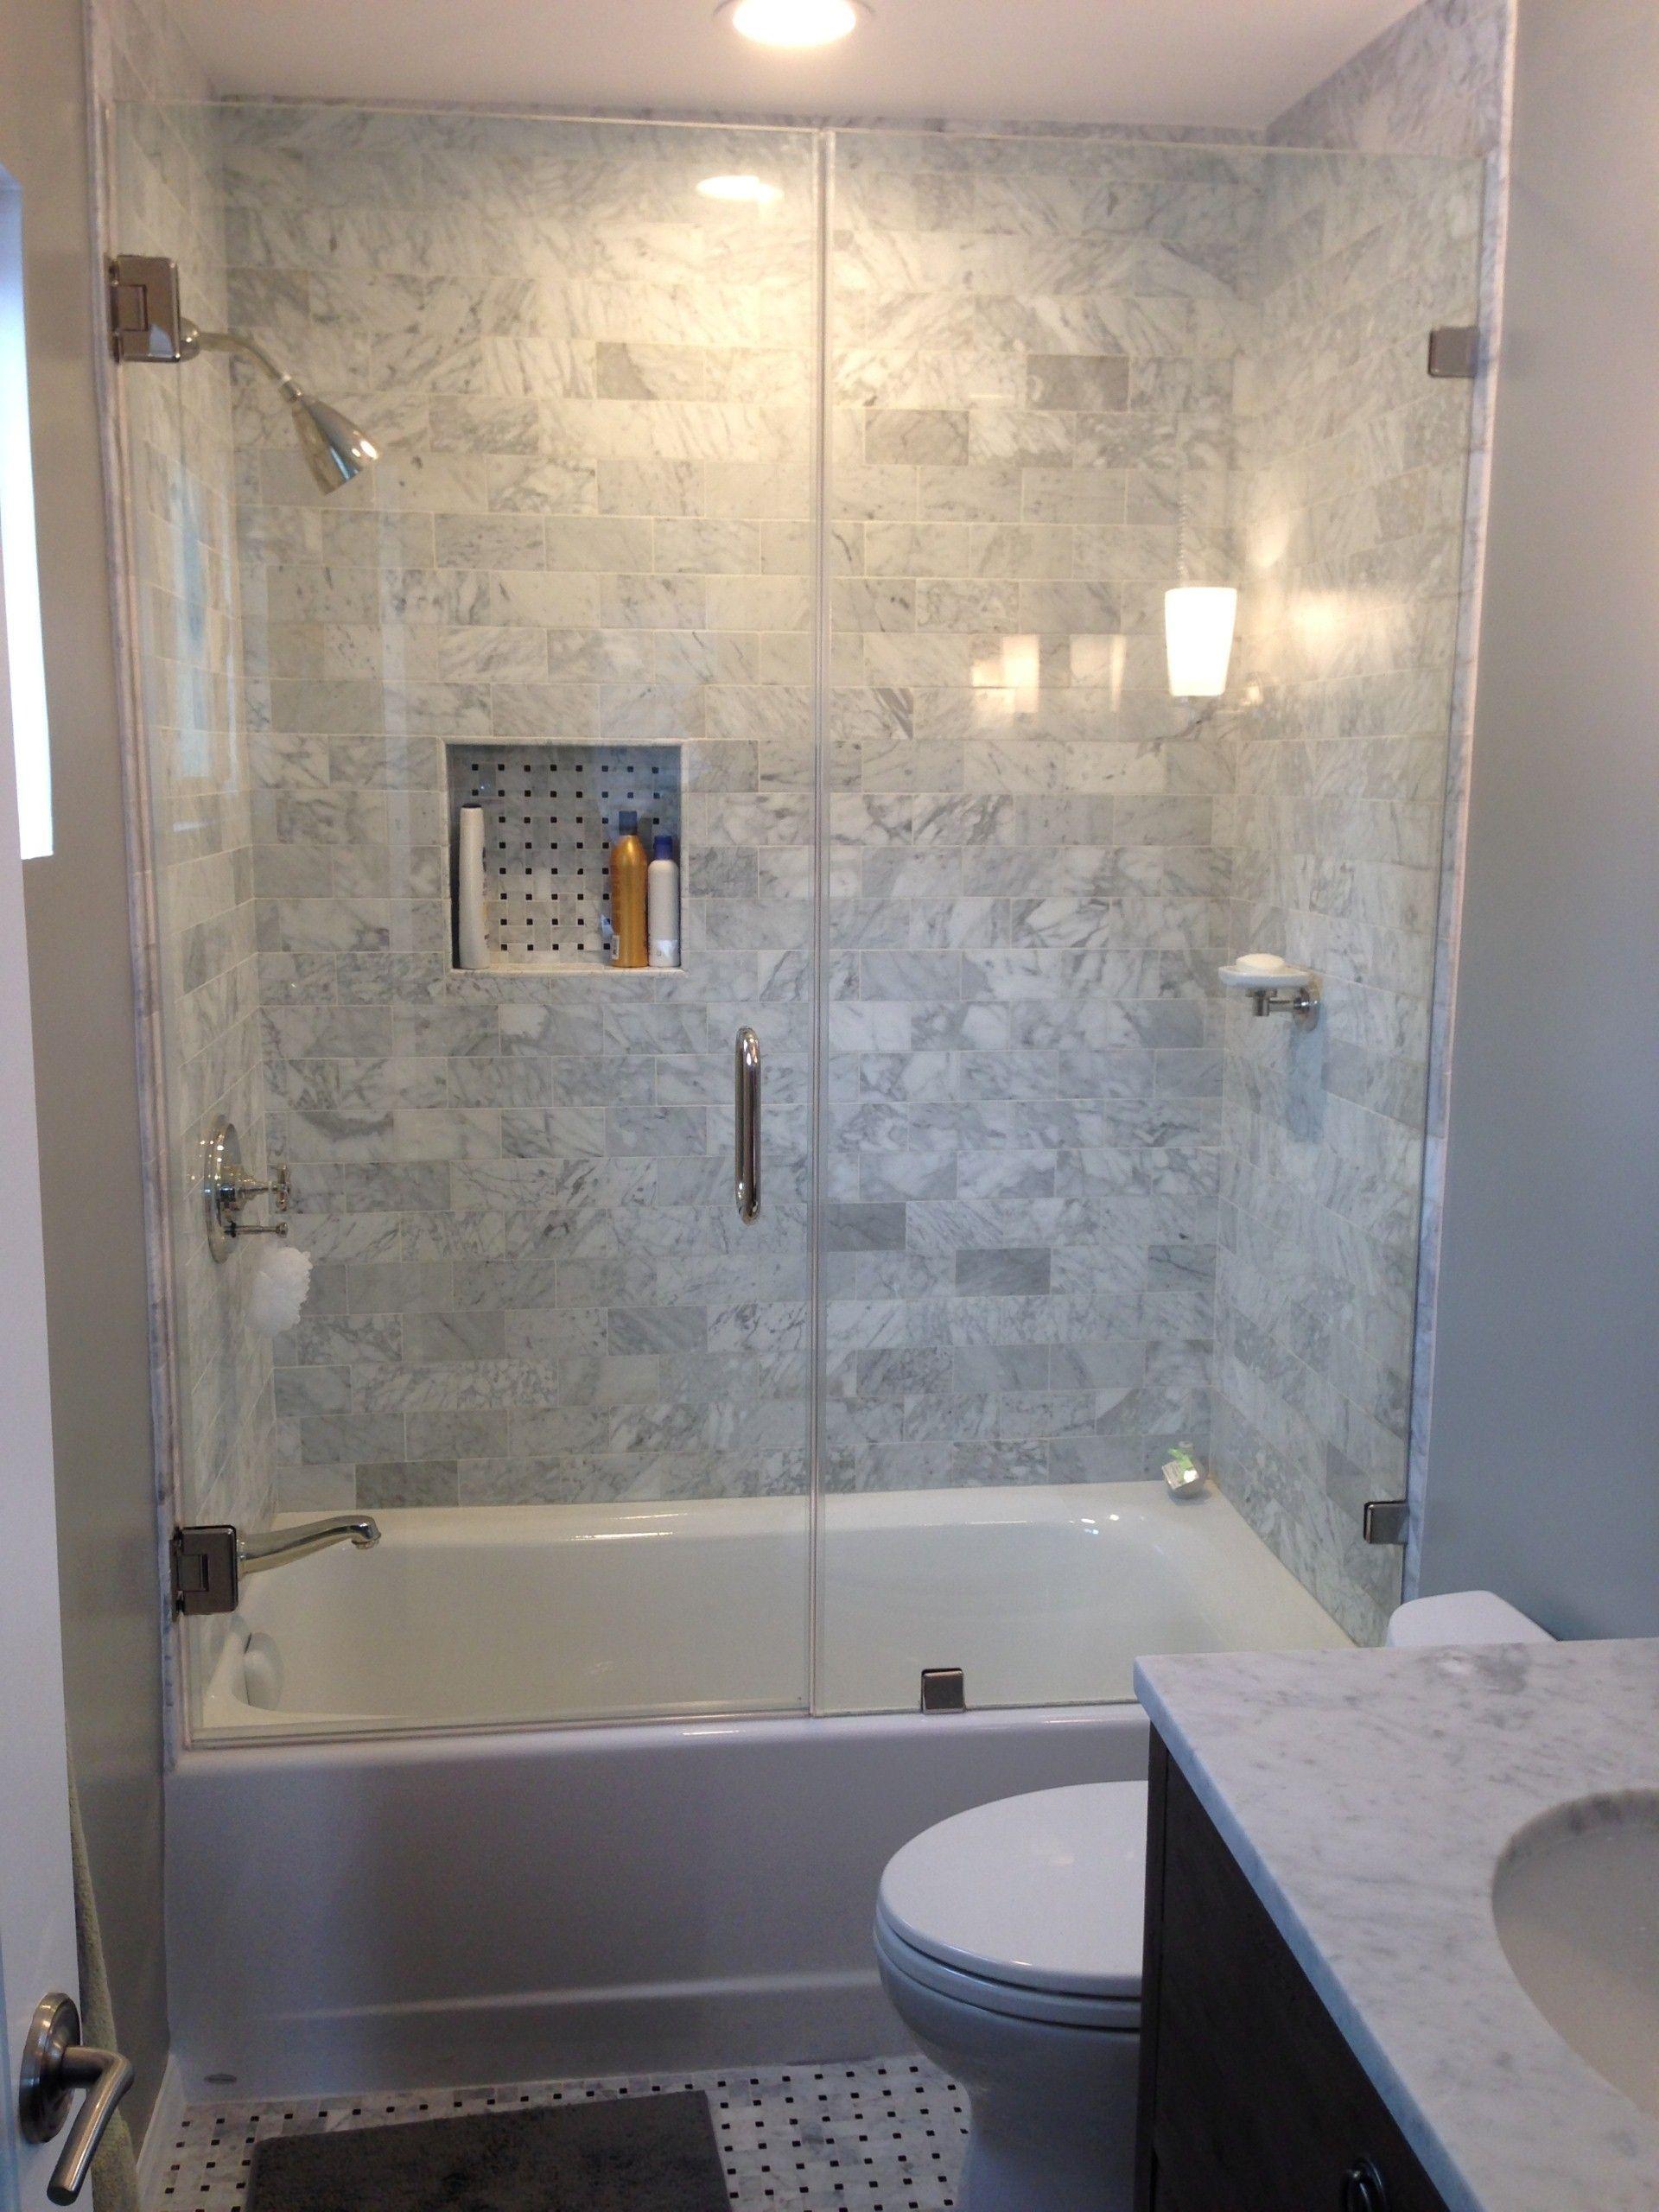 10 x 6 badezimmerdesigns awesome bathroom ideas for small bathrooms  awesomebathroomsideas